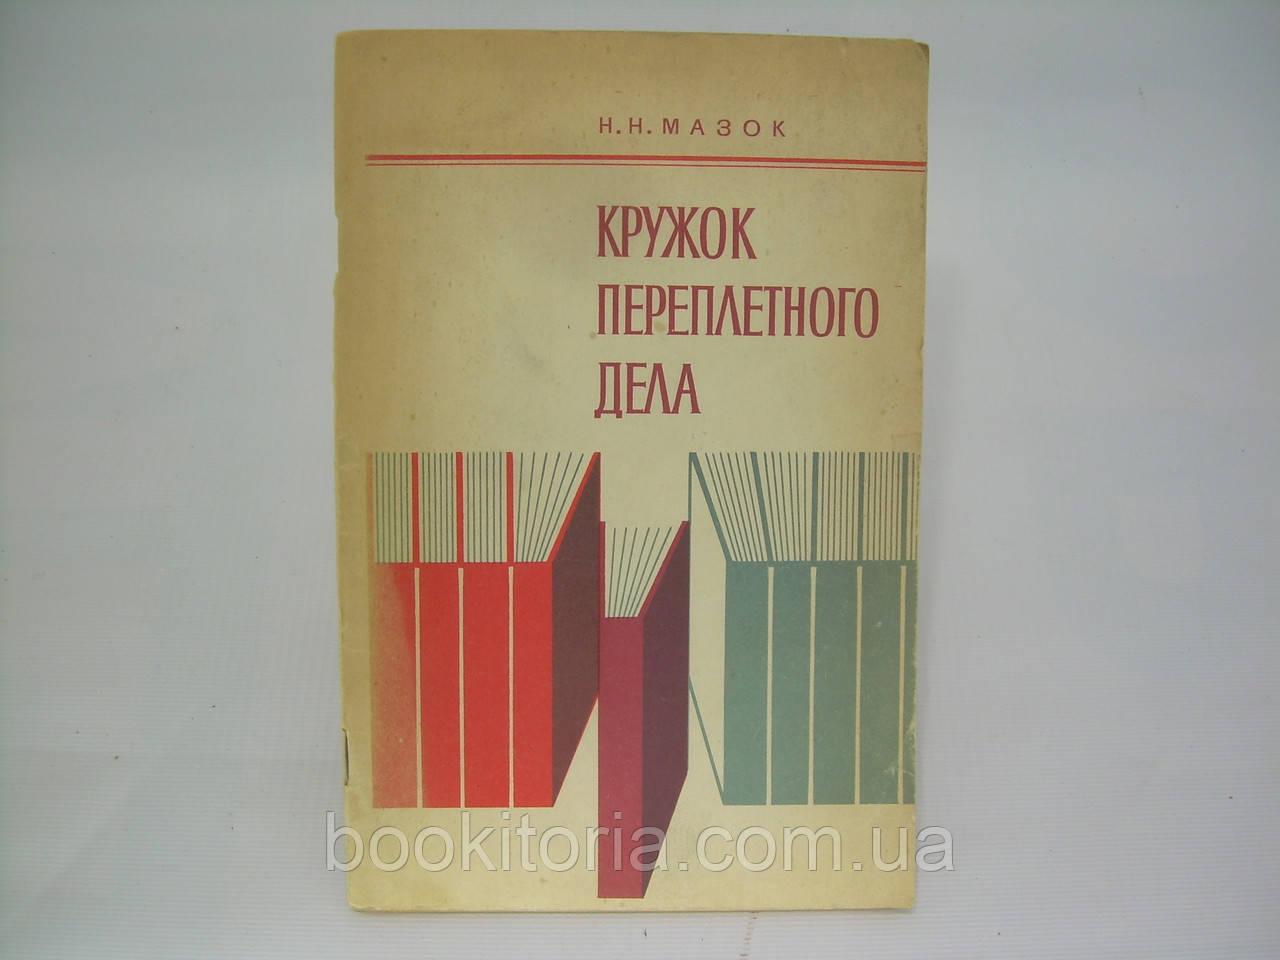 Мазок Н.Н. Кружок переплетного дела (б/у).